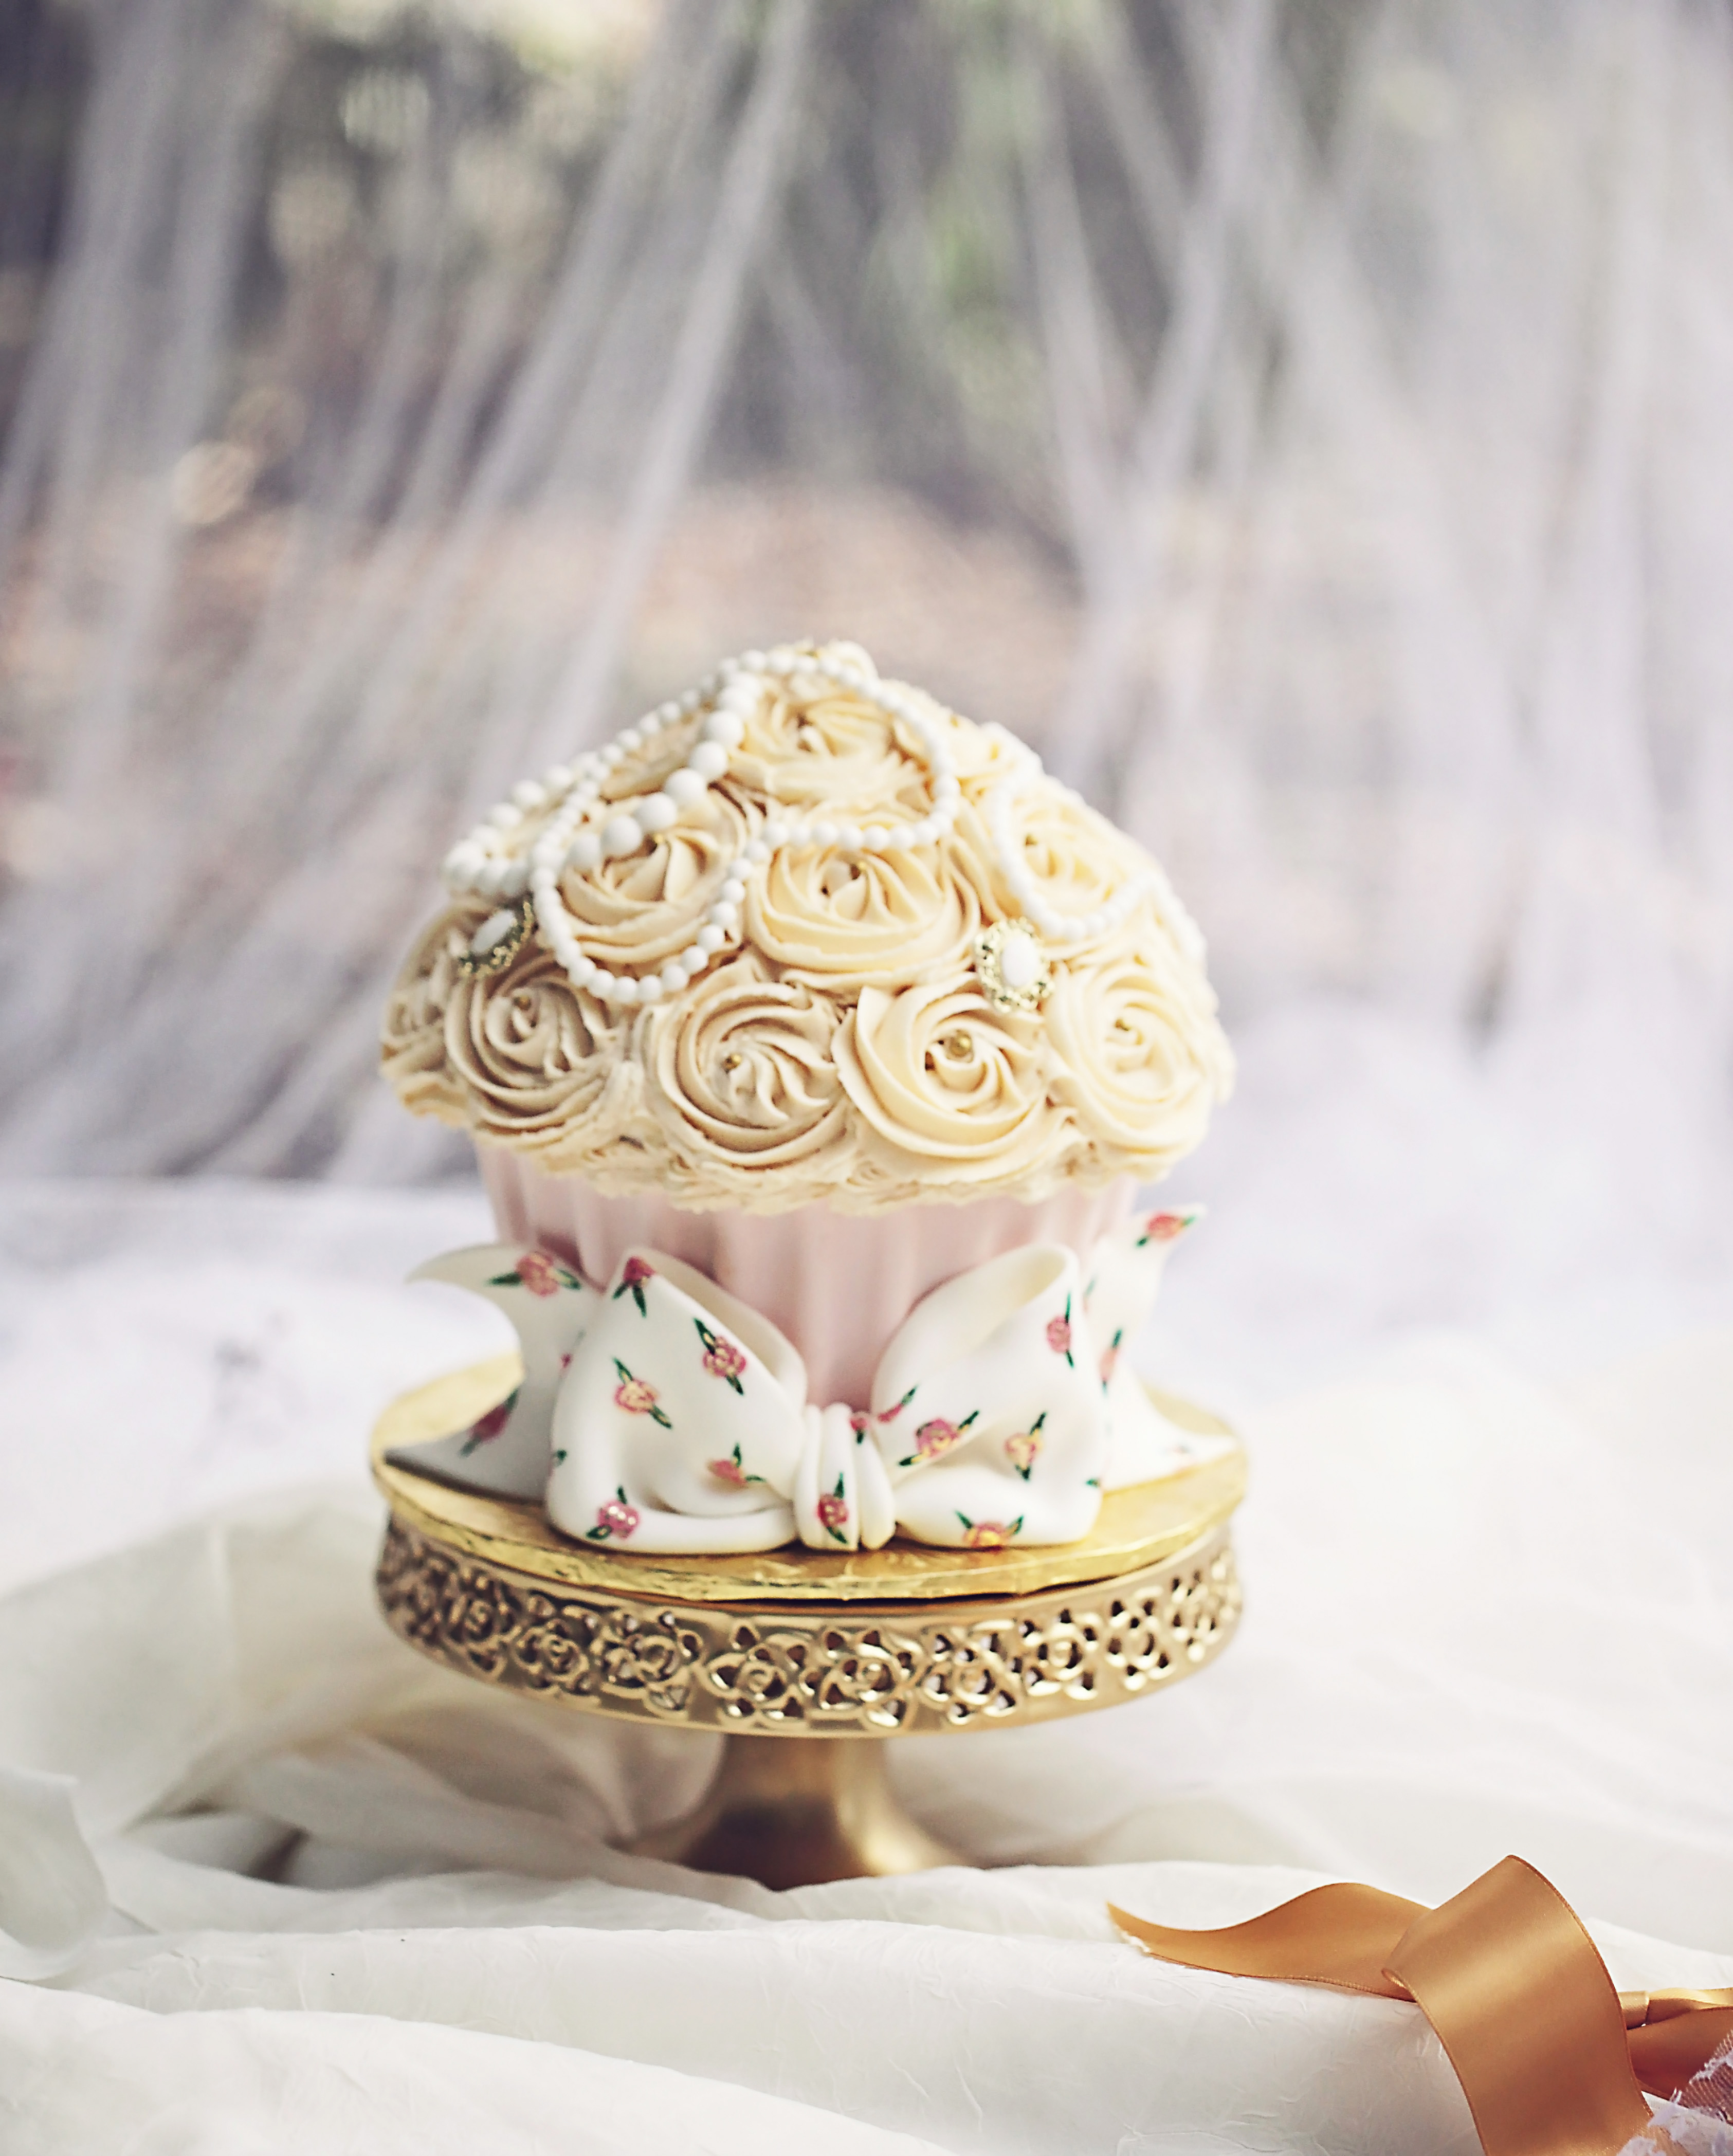 CAKE SMASH SAN DIEGO